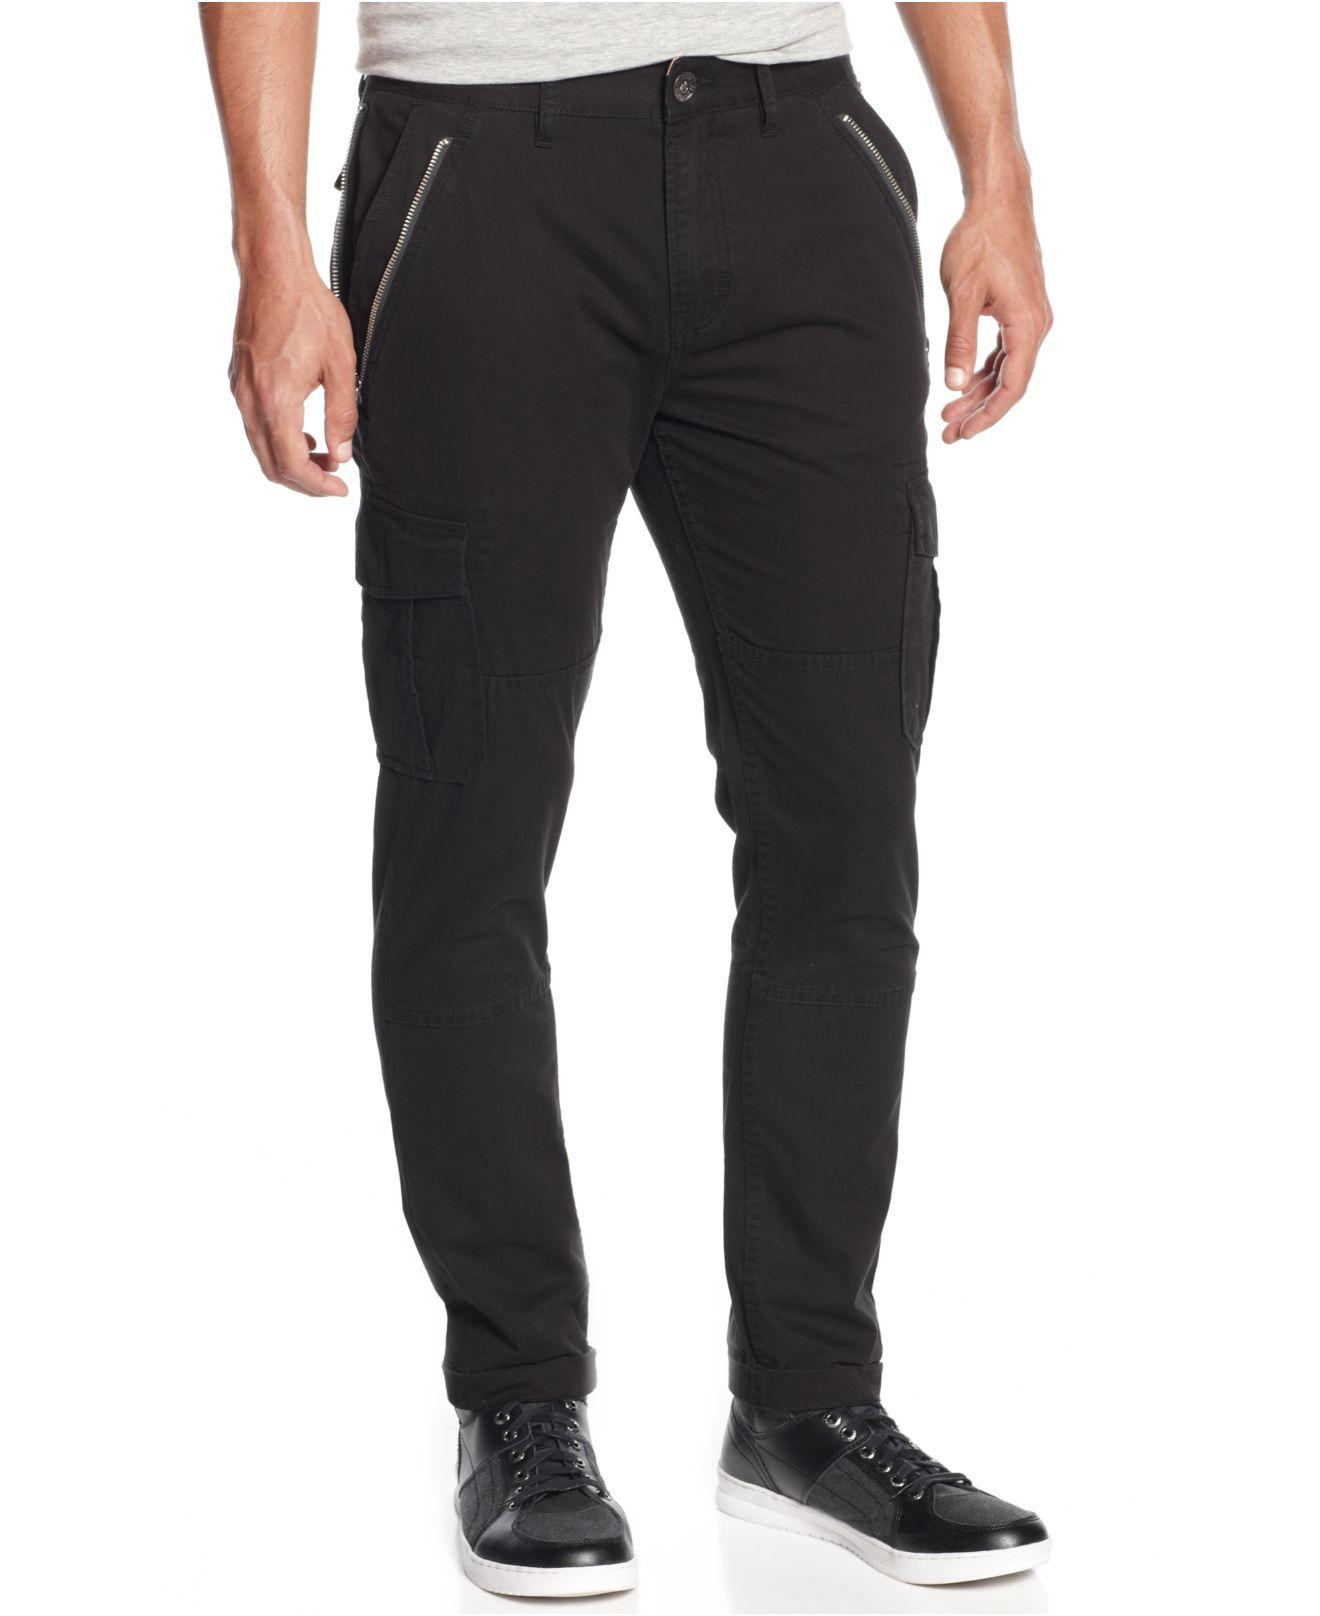 Guess Slim Taper Cargo Pants In Black For Men Lyst